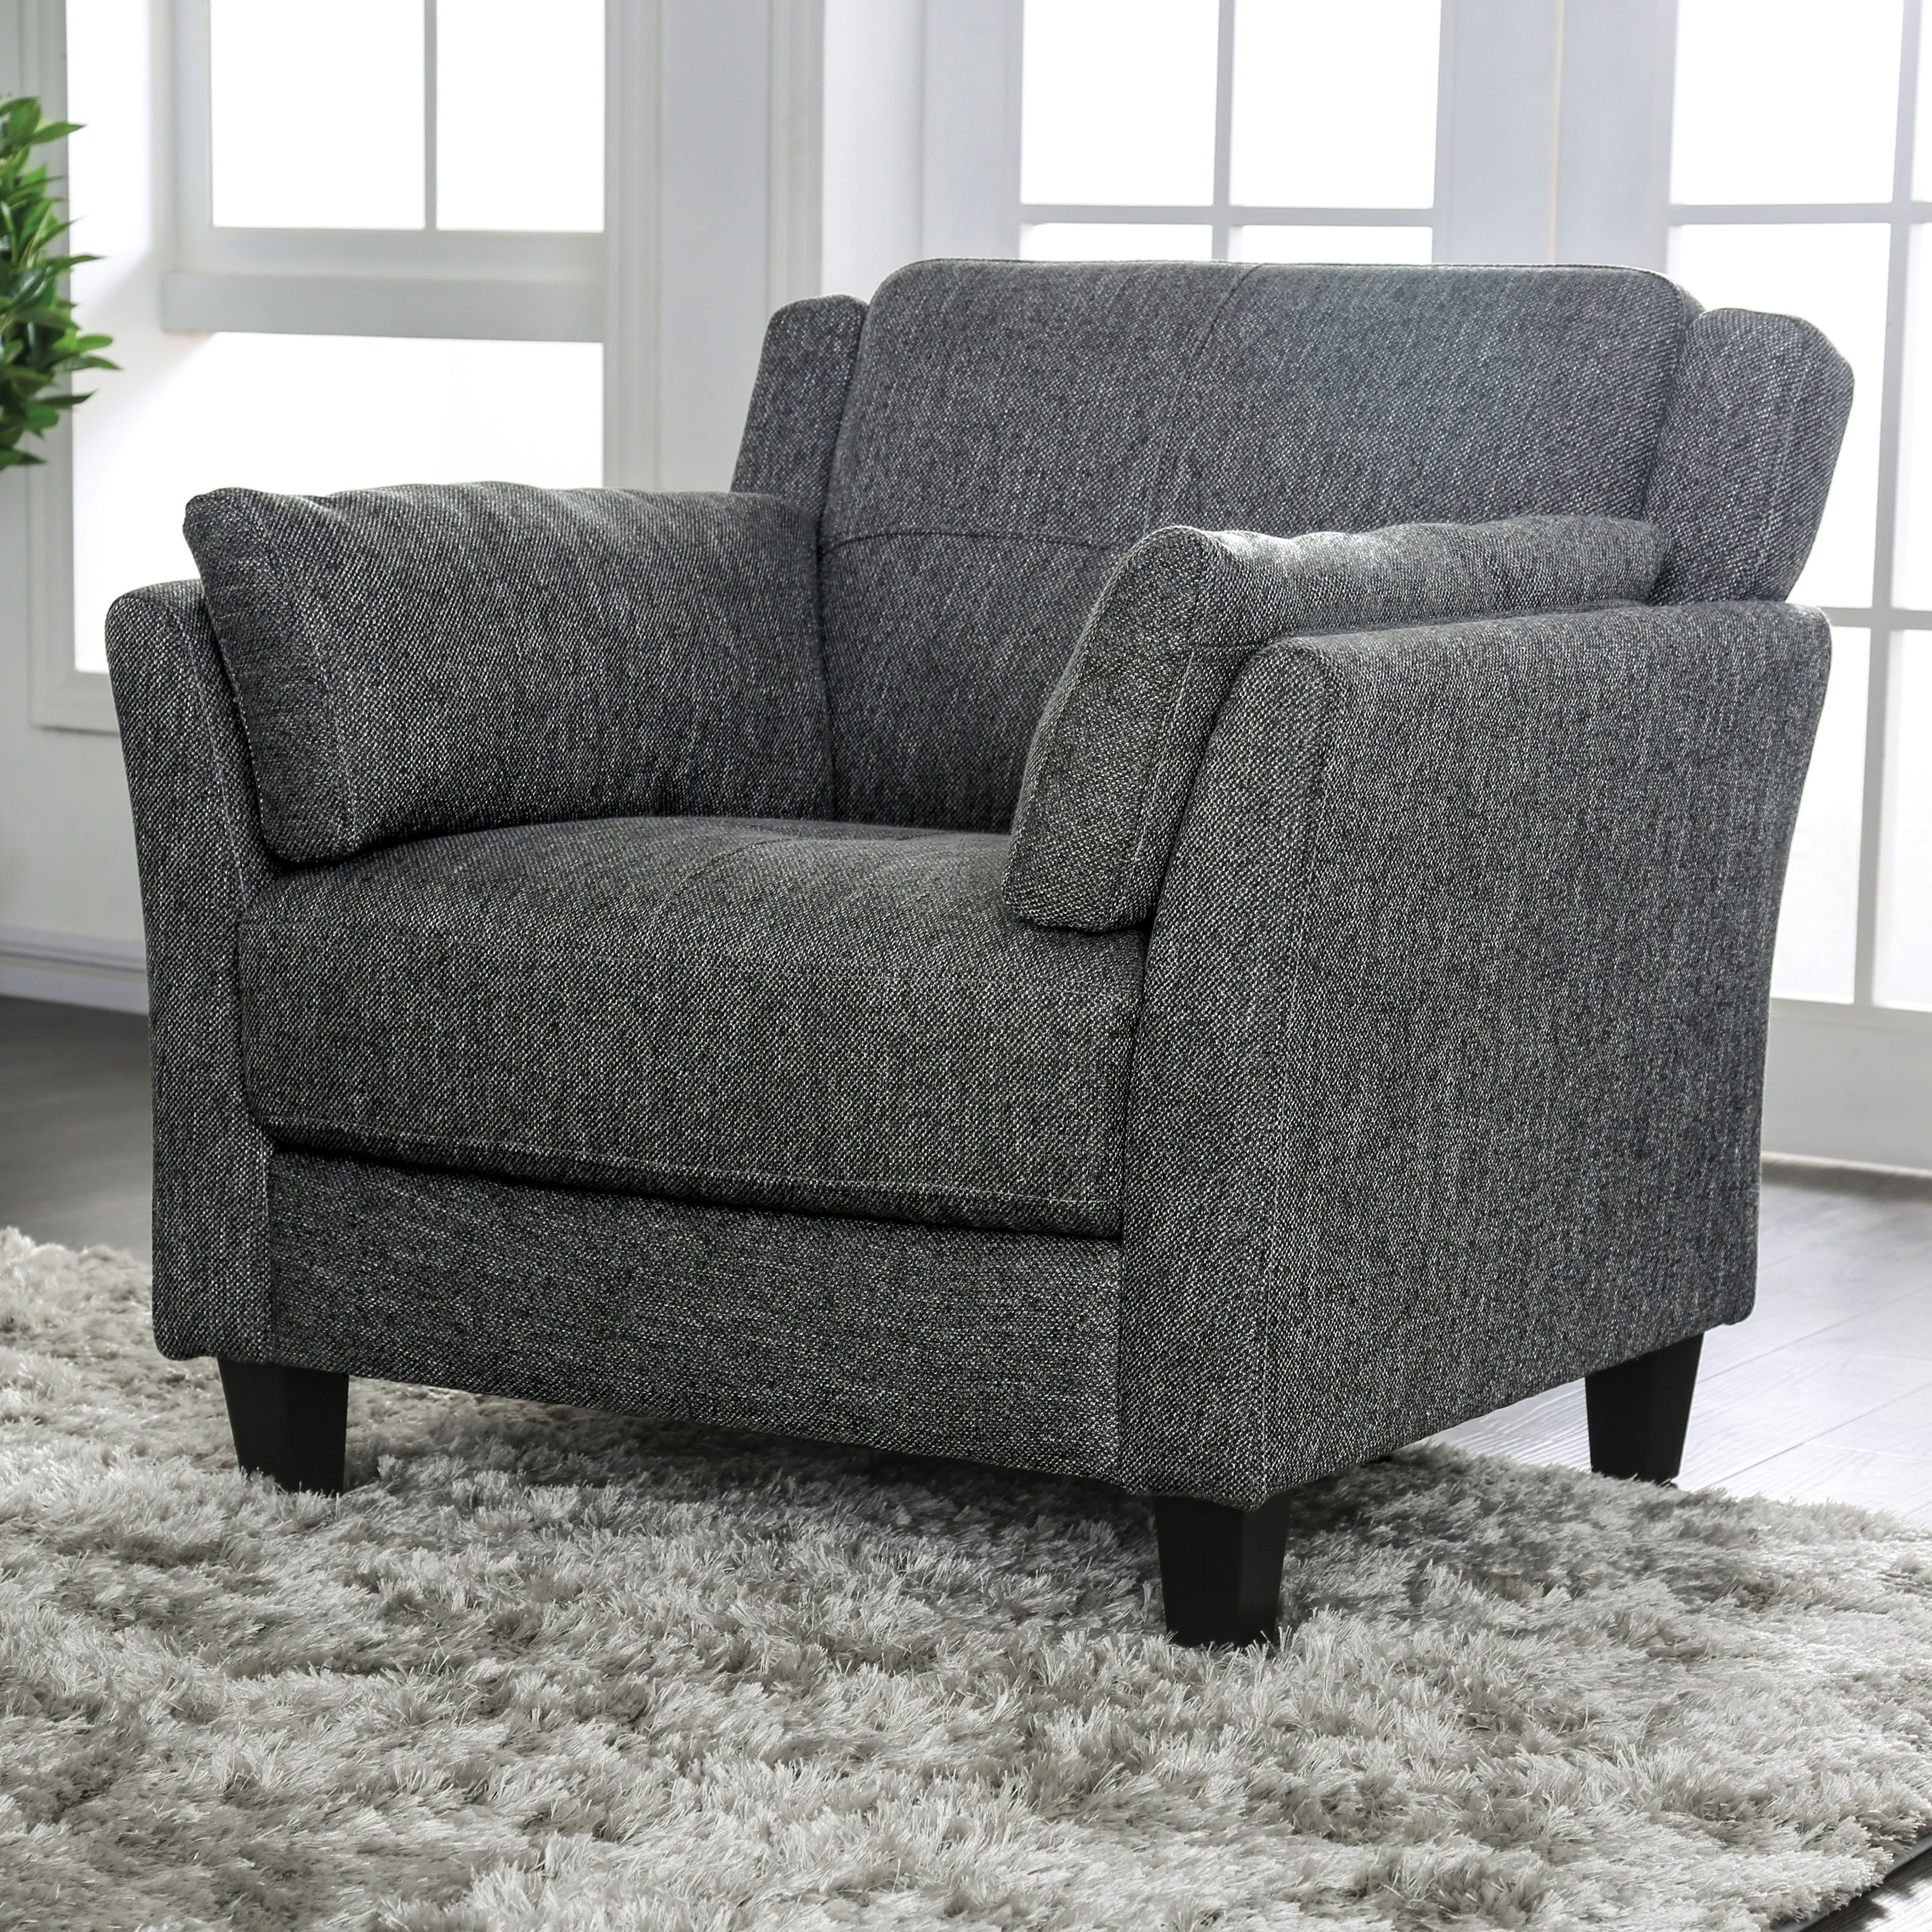 Swell Furniture Of America Bayard Mid Century Modern Grey Accent Chair Inzonedesignstudio Interior Chair Design Inzonedesignstudiocom